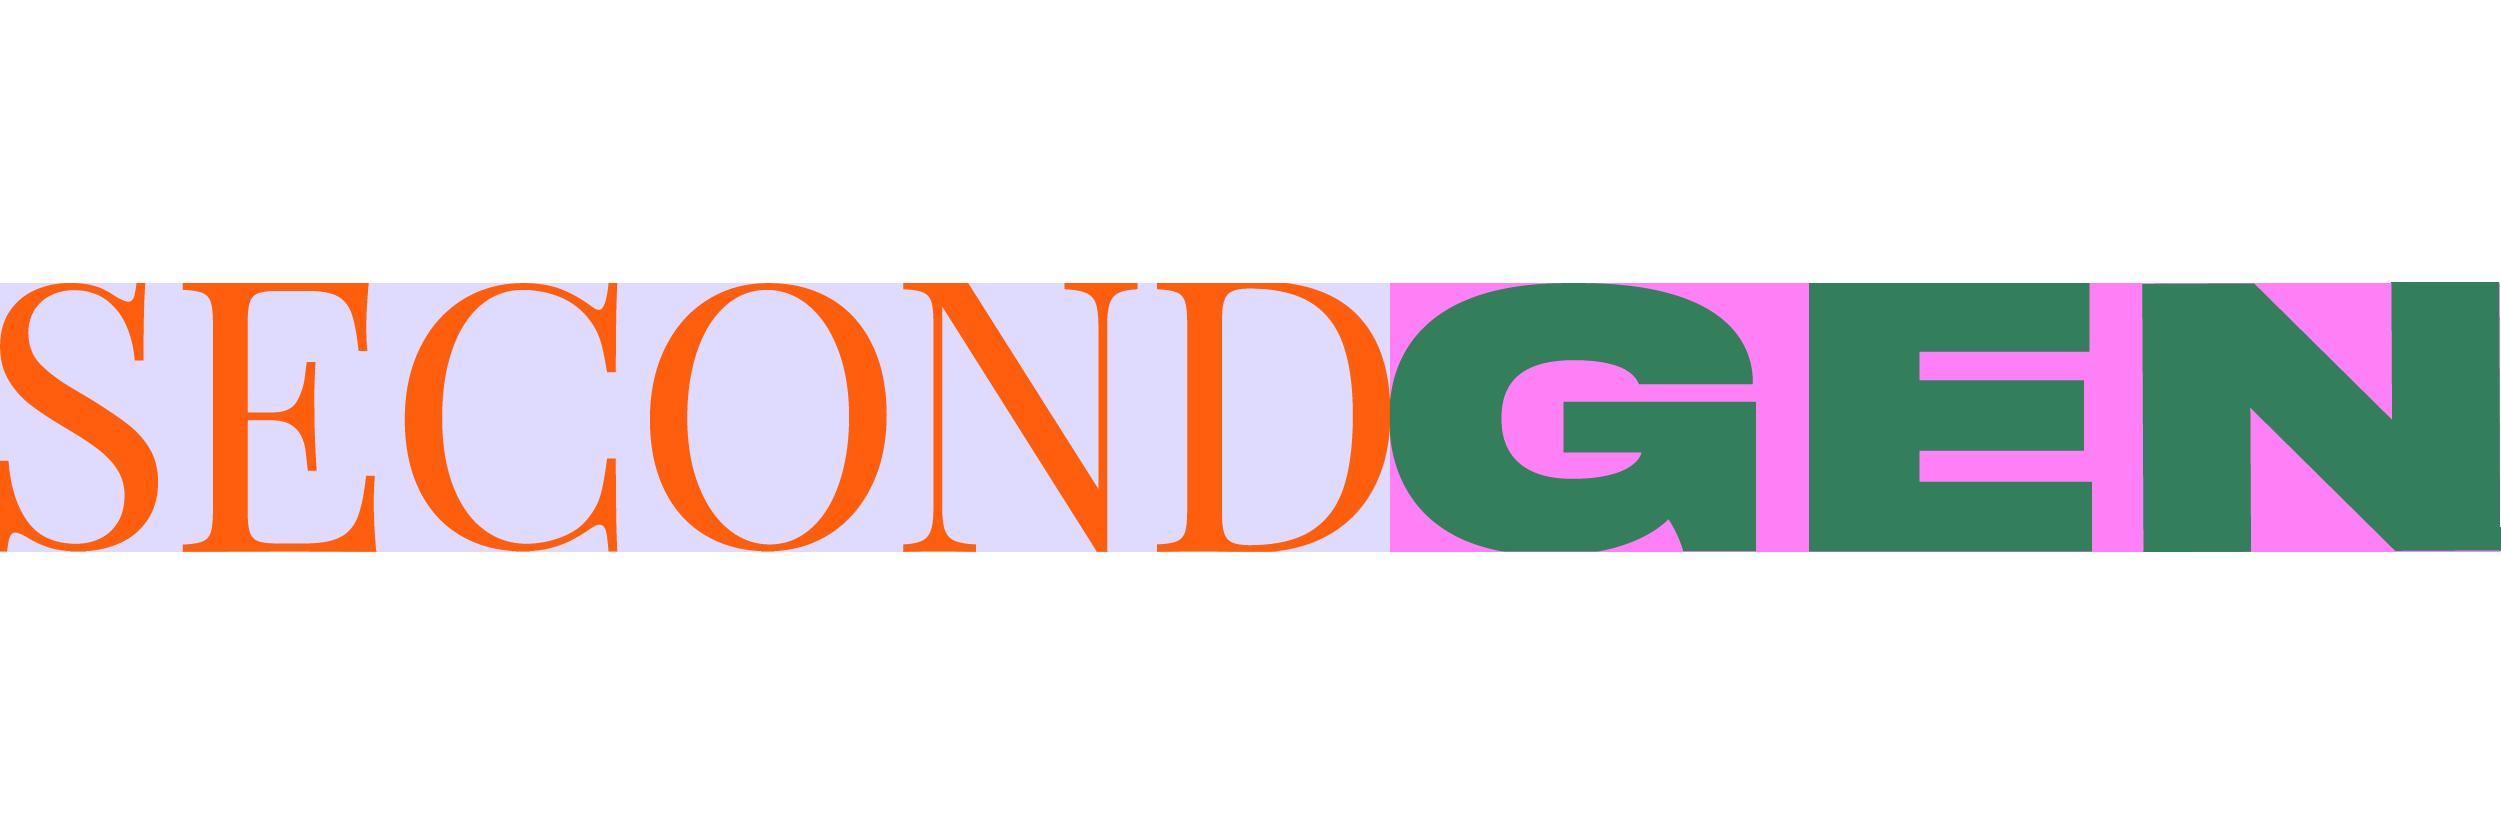 Second Gen logo